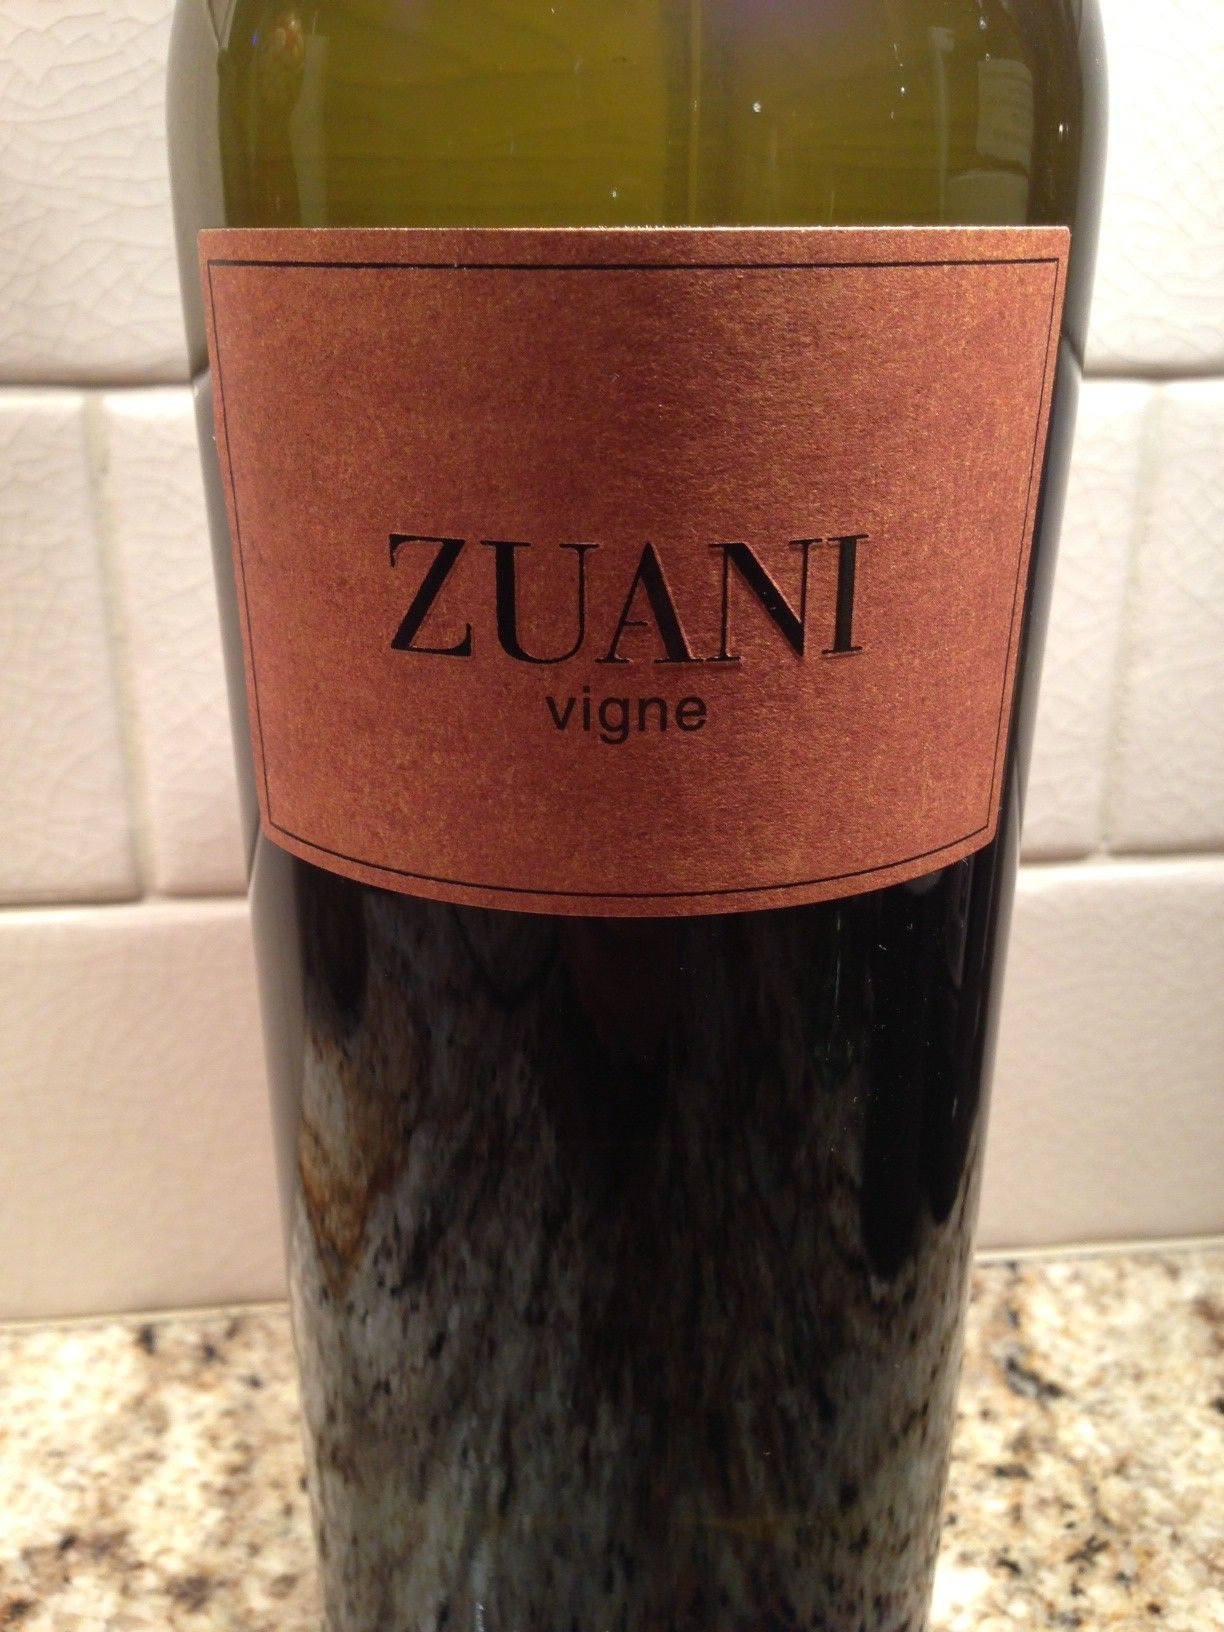 2011 Zuani Vigne Collio Bianco Food Wine Chickie Insider Wine Images Wine Recipes Wine Bottle